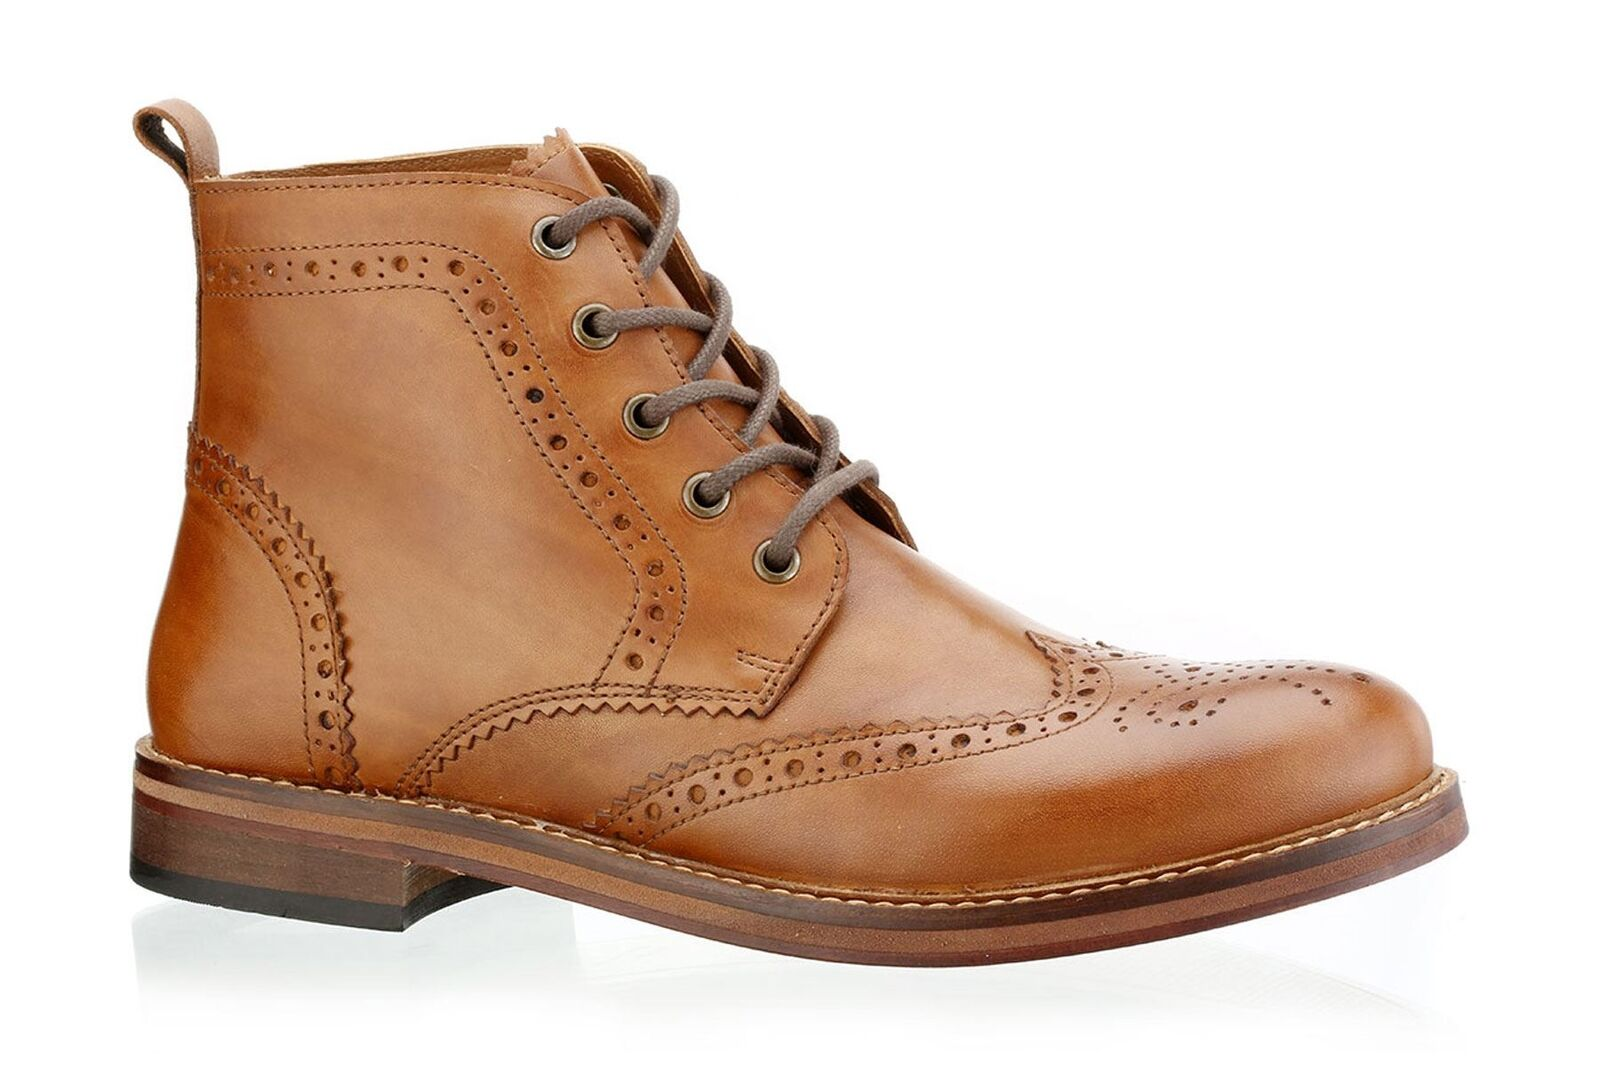 rot Tape Claroton Handmade Leather Sole Brogues Mens Stiefel Tan braun